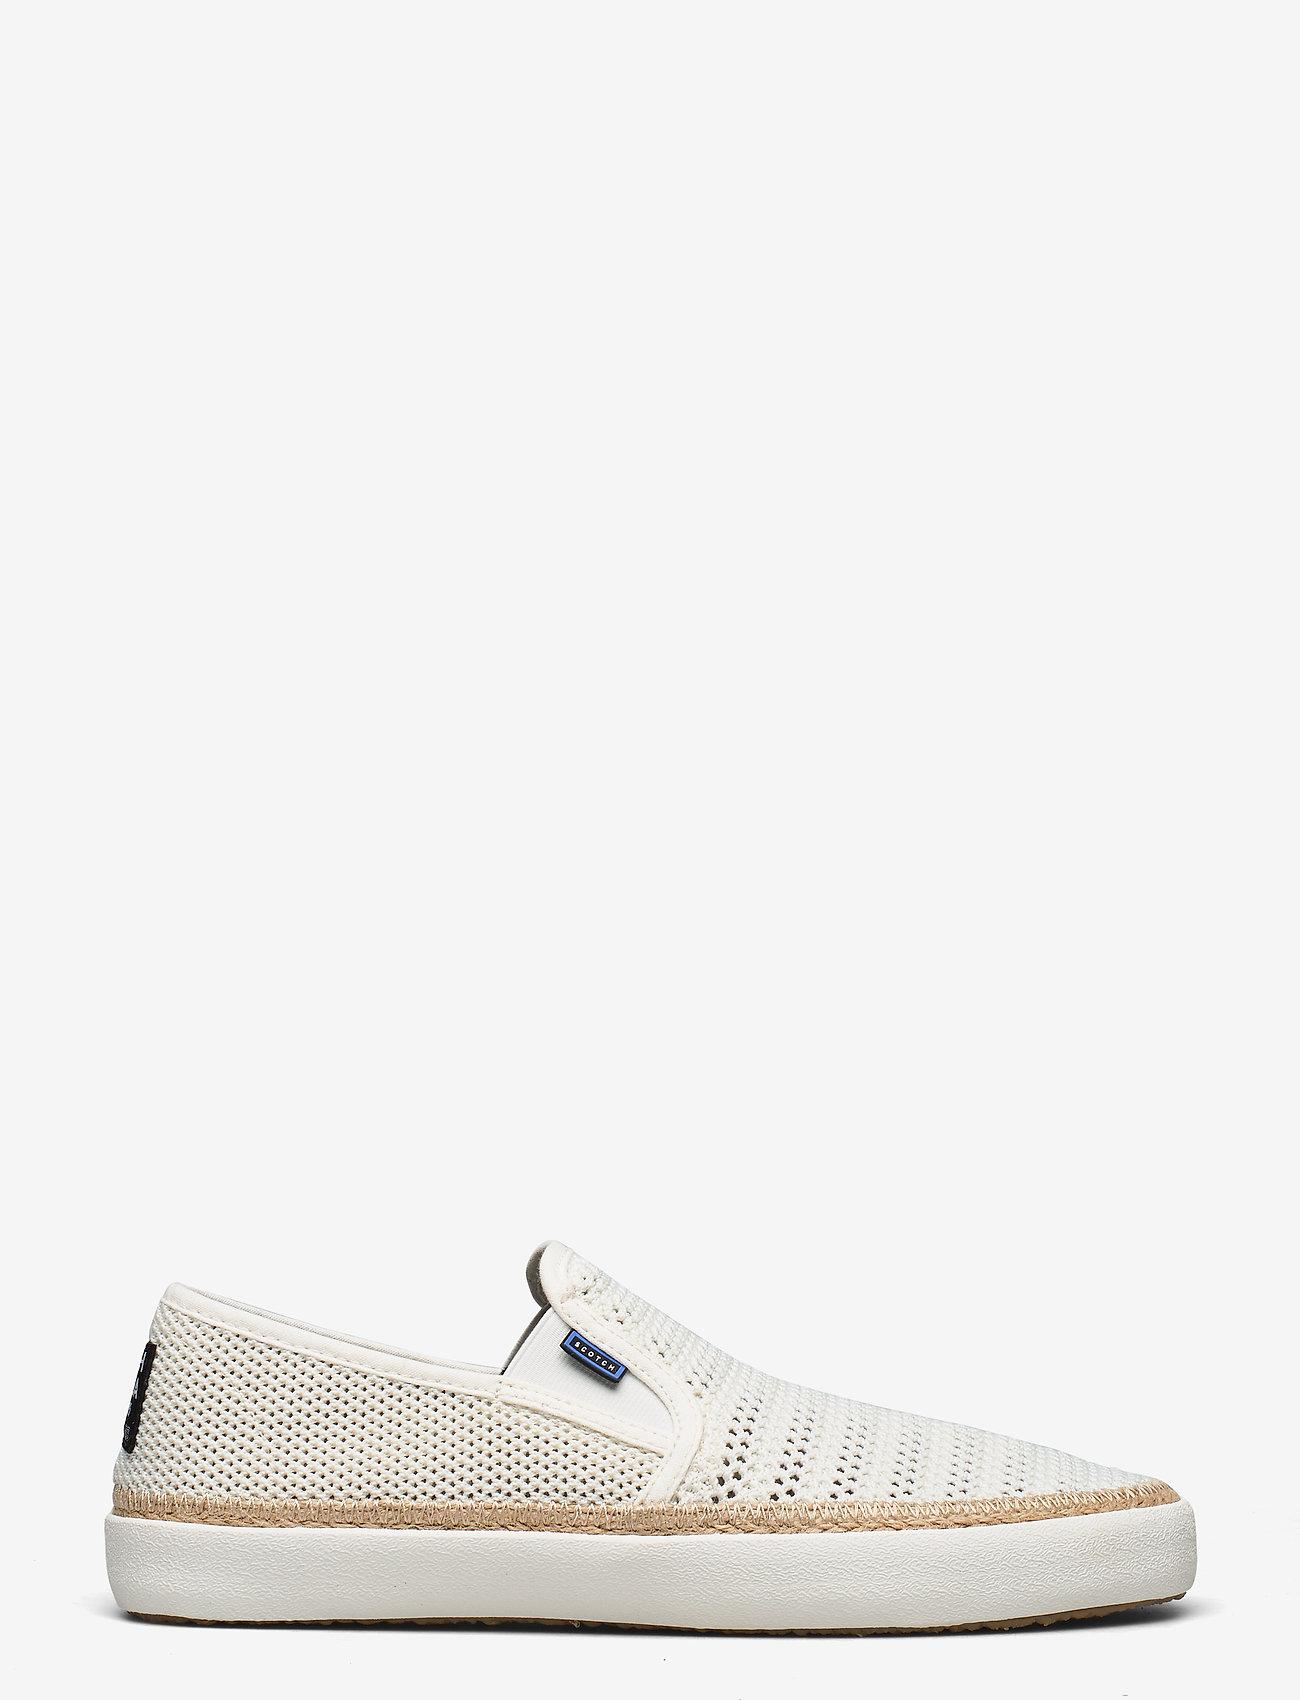 Scotch & Soda Shoes - Izomi Slip-on shoes - baskets slip-ons - off white - 1